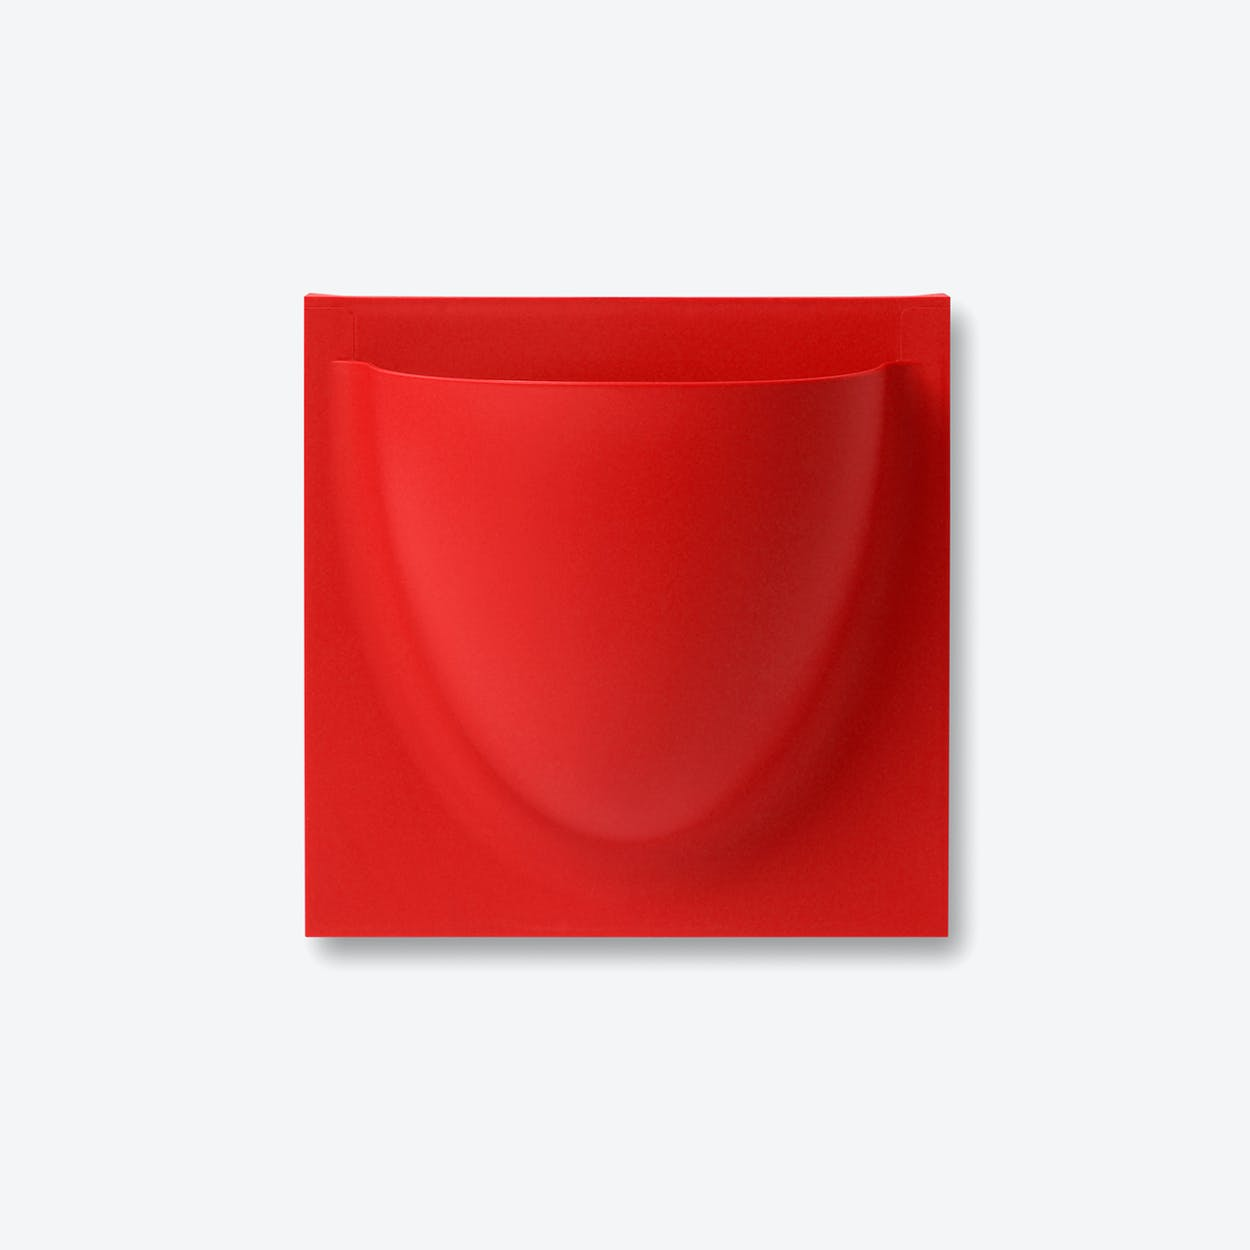 Wall Planter / Jar Mini in Traffic Red (Set of 2)